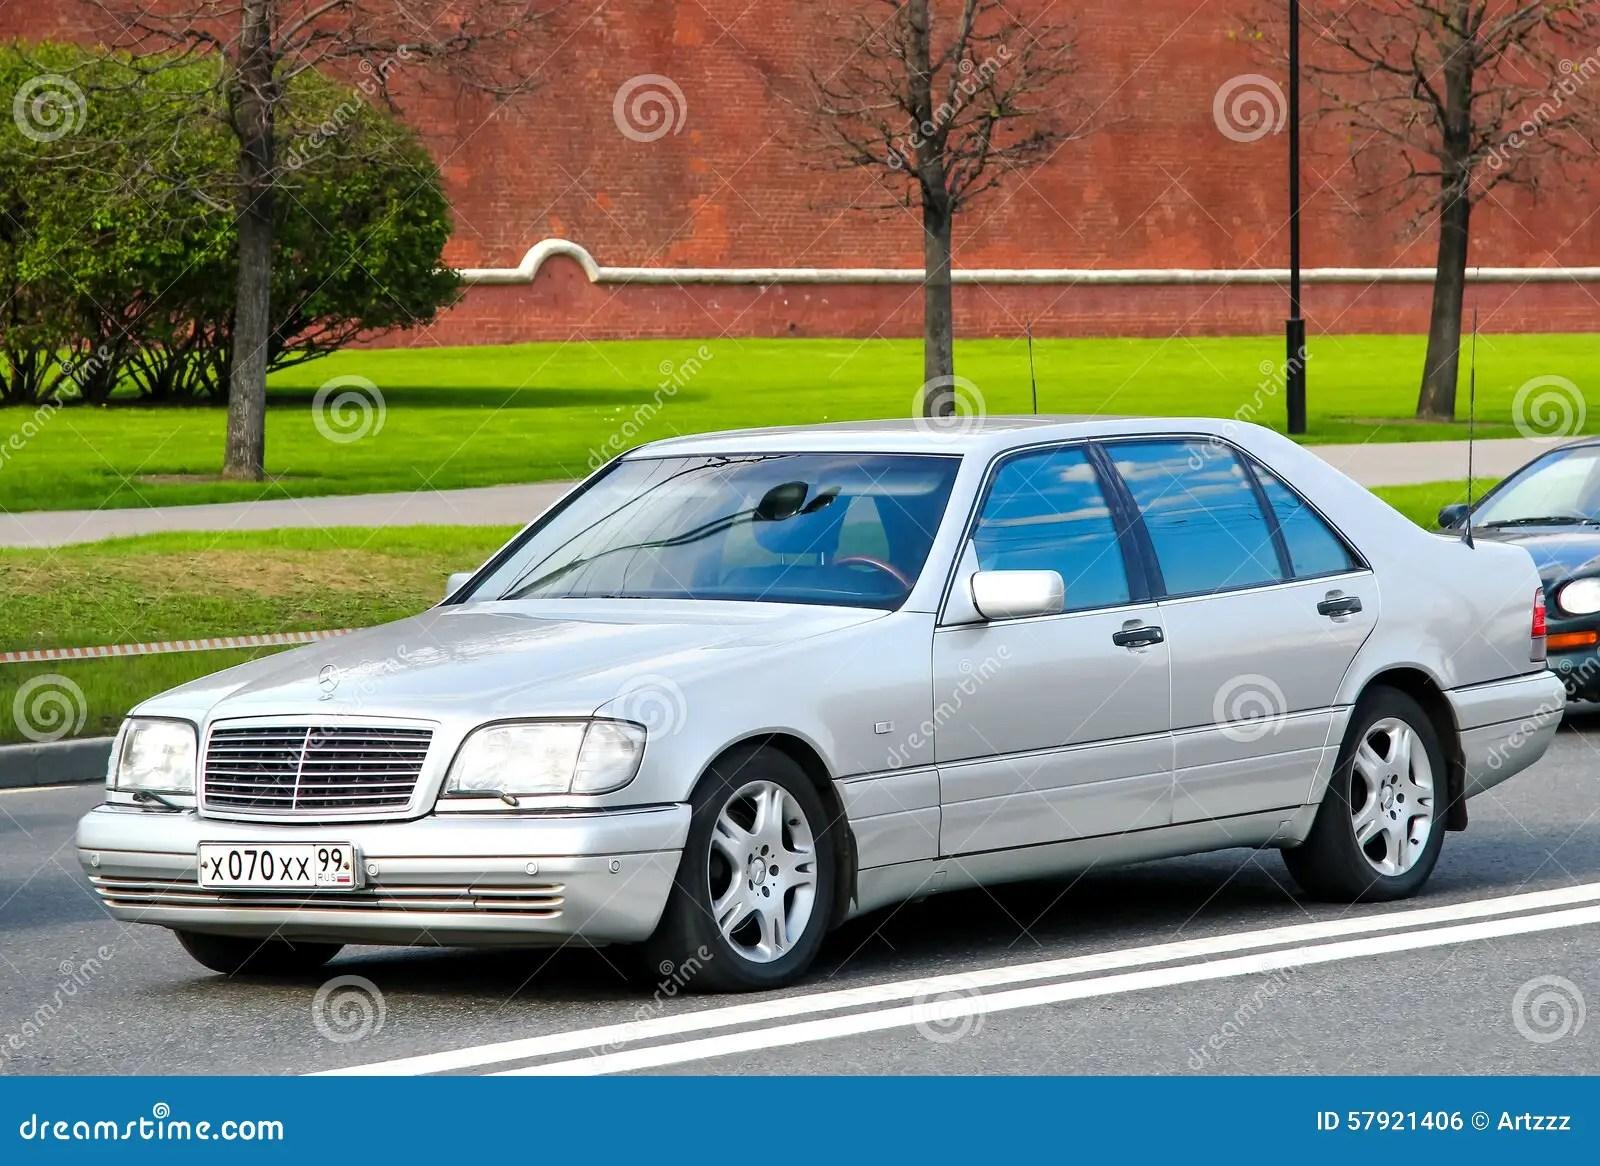 Mercedesbenz W140 Sclass Editorial Photo  Image 57921406